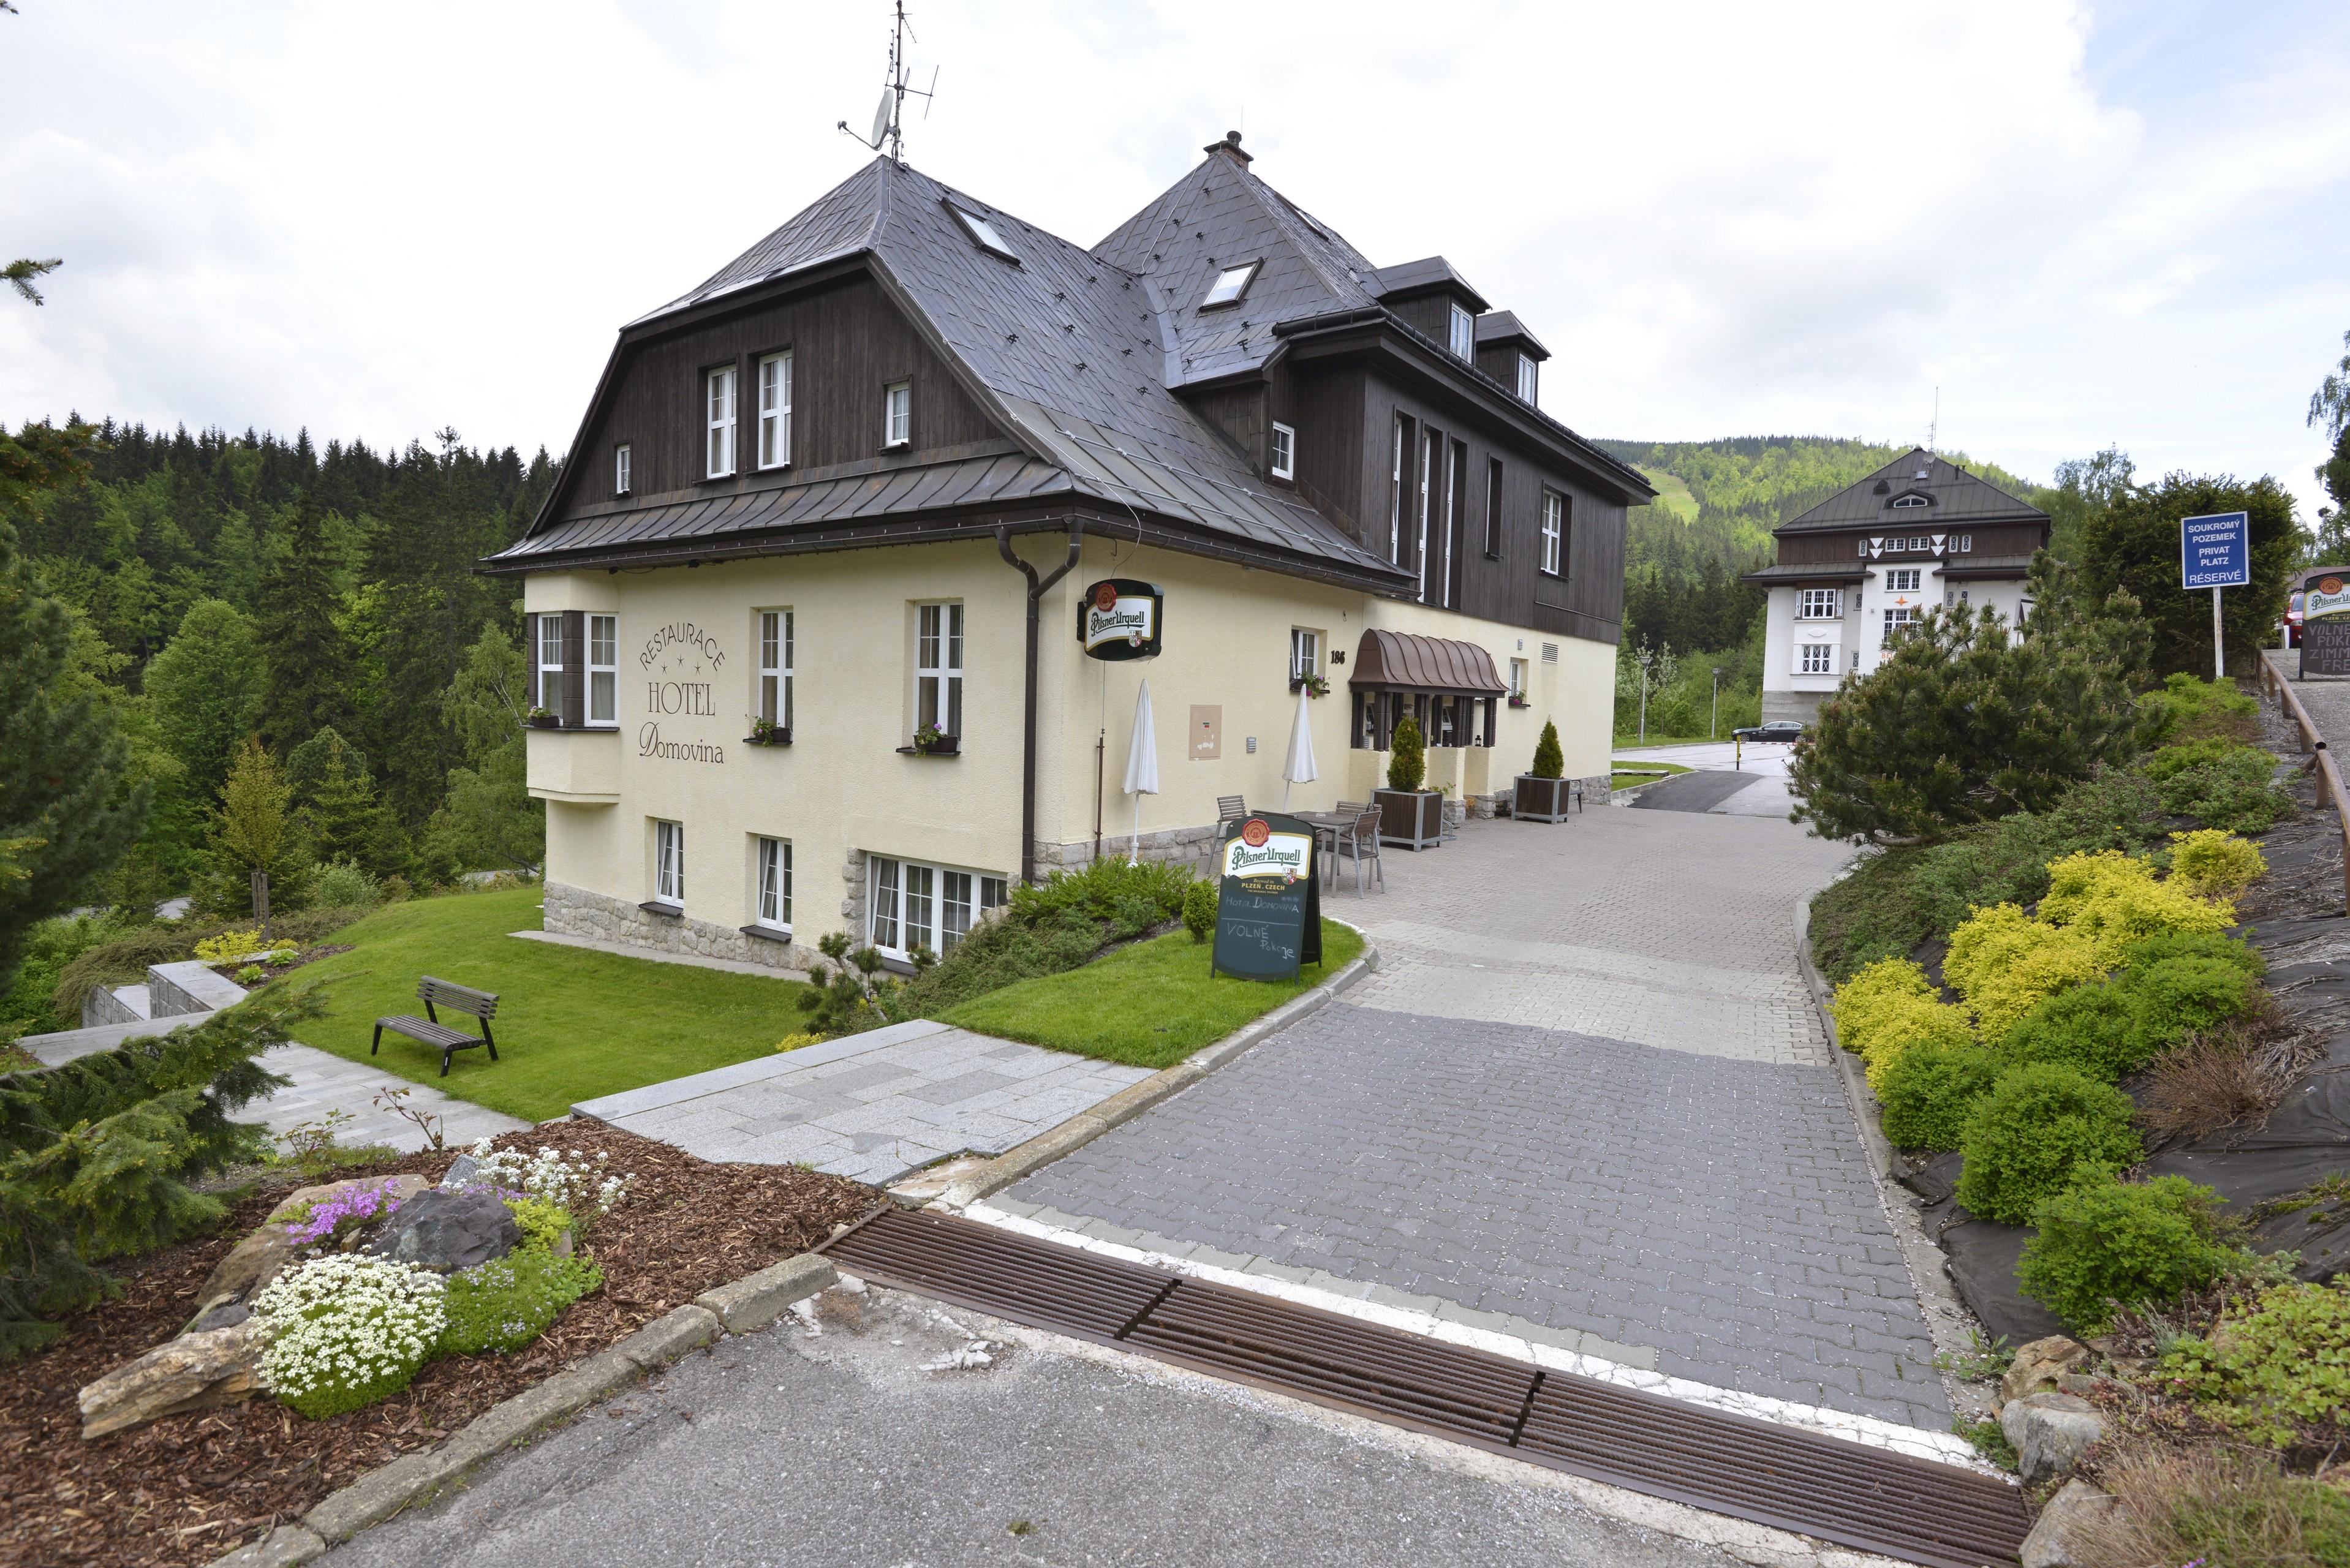 Špindlerův Mlýn - Hotel Domovina1